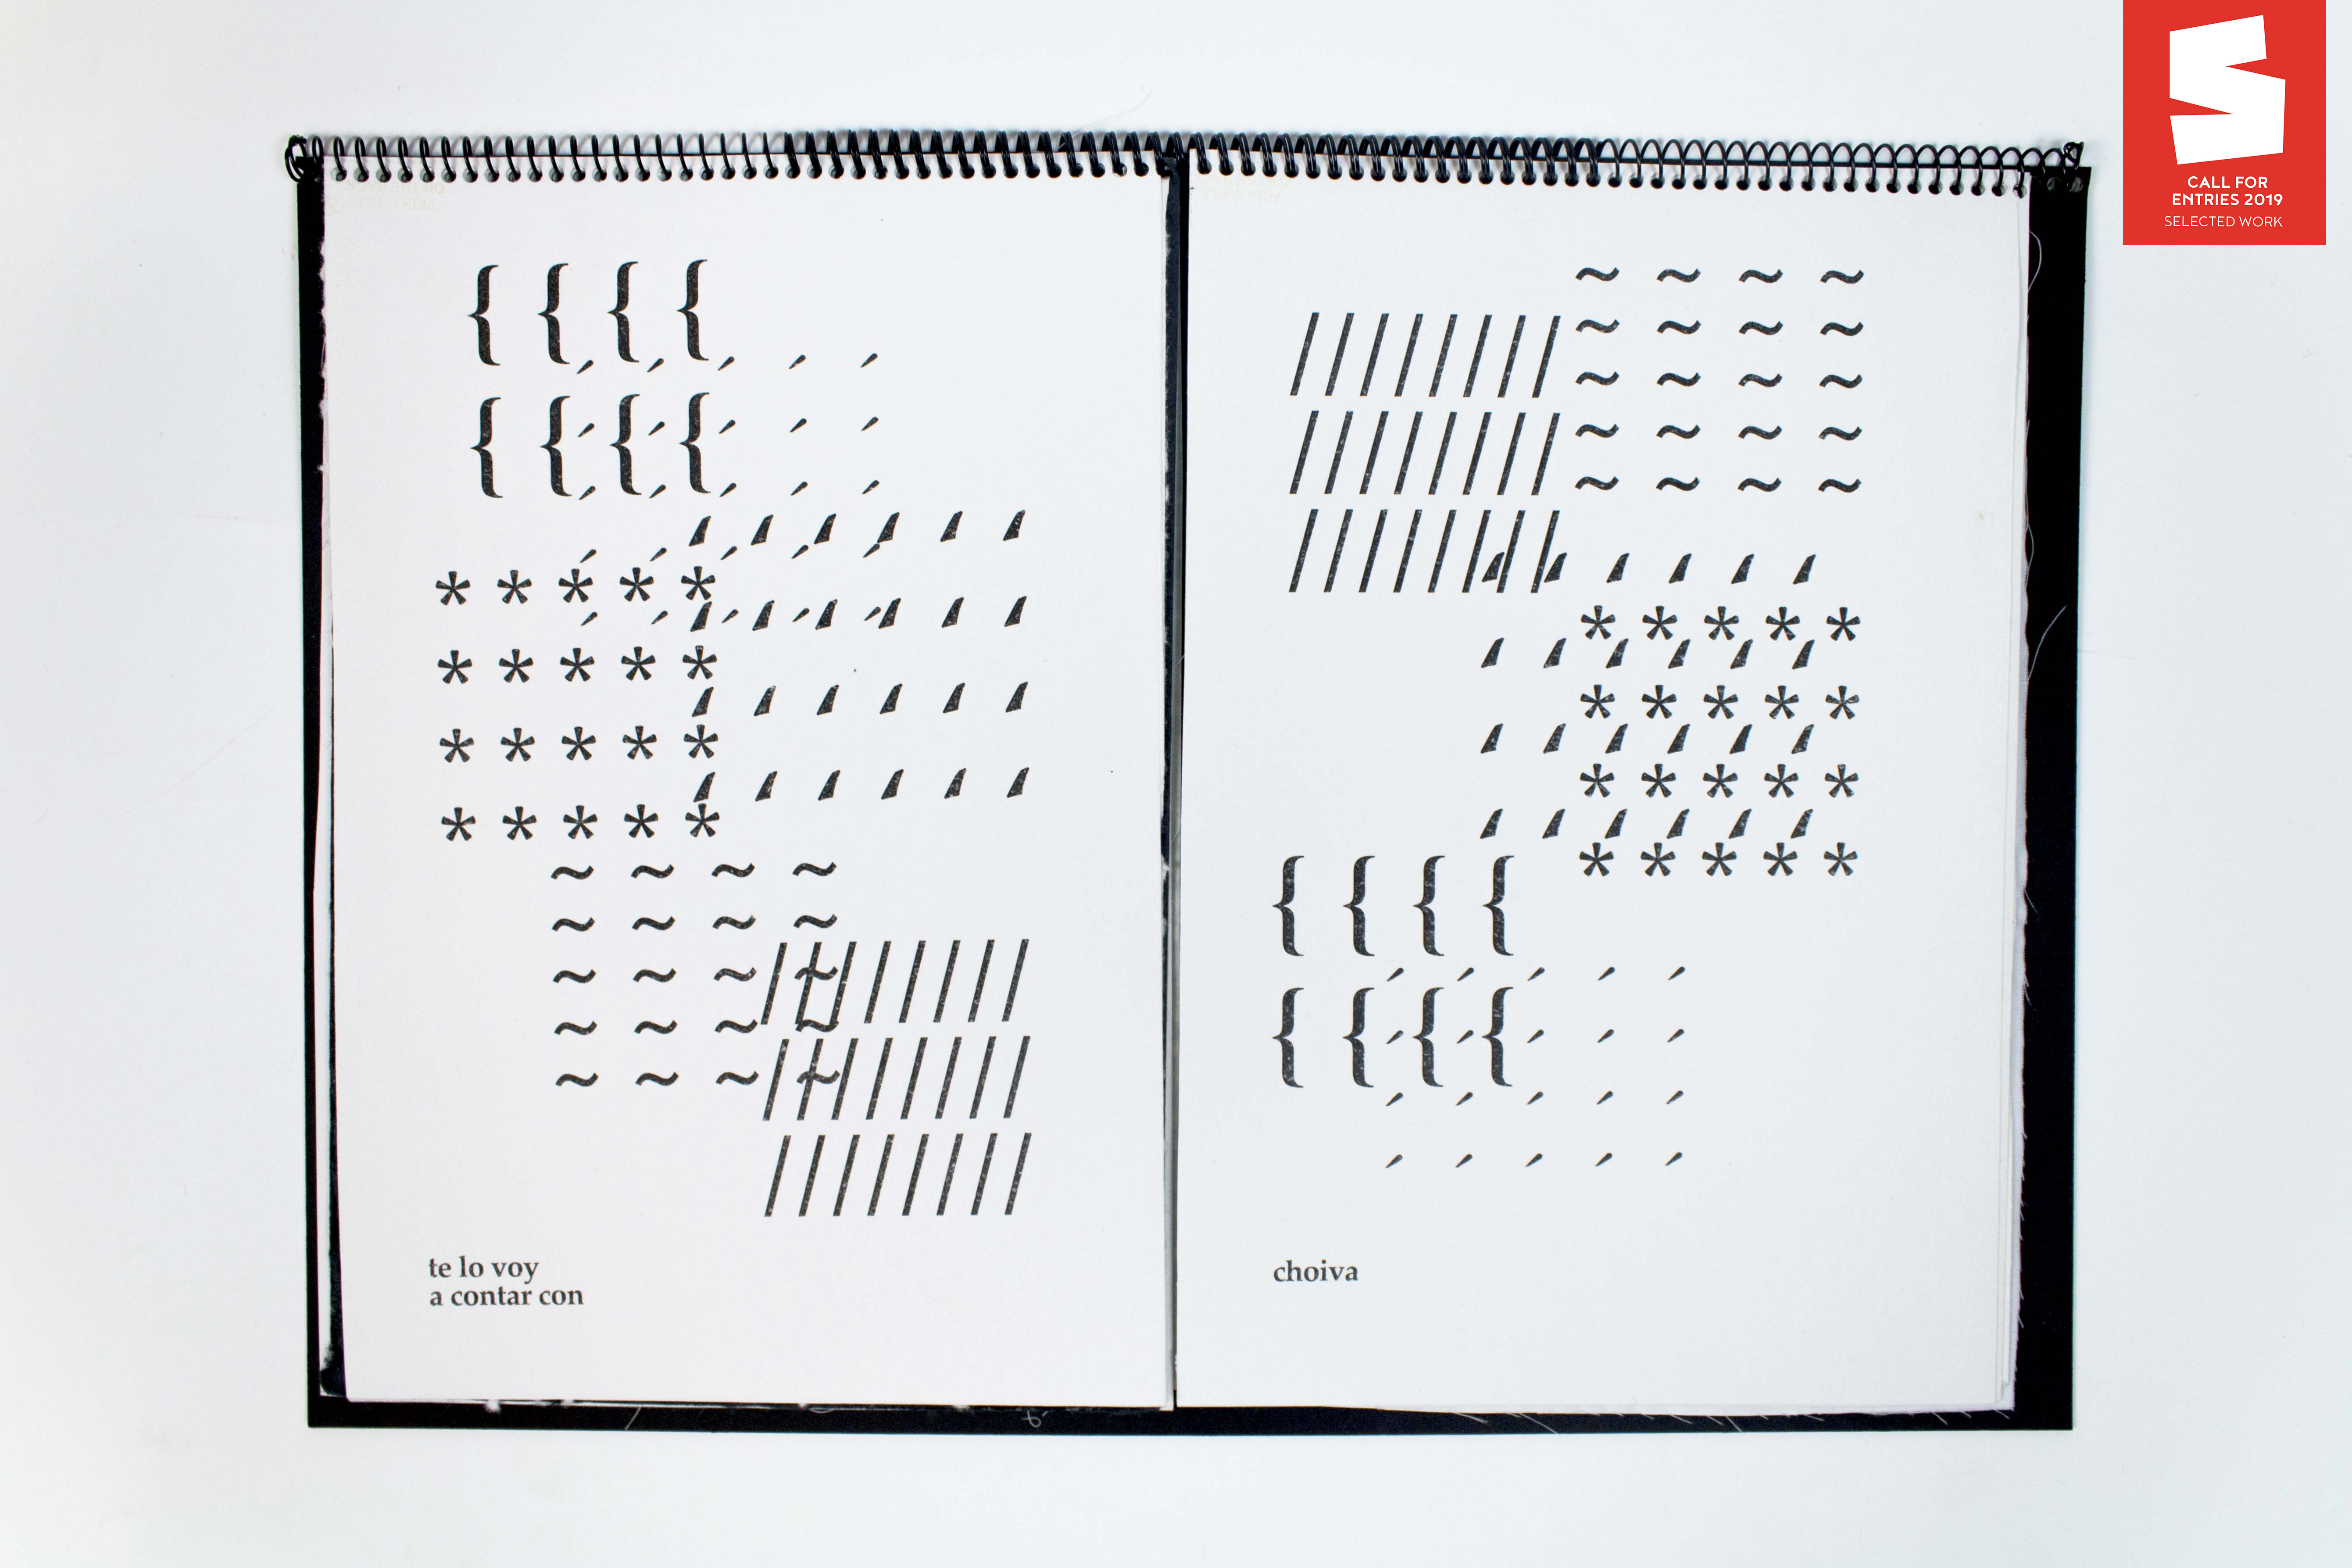 Te lo voy a contar con... 'choiva' by Natalia Lareo Rodríguez - Creative Work